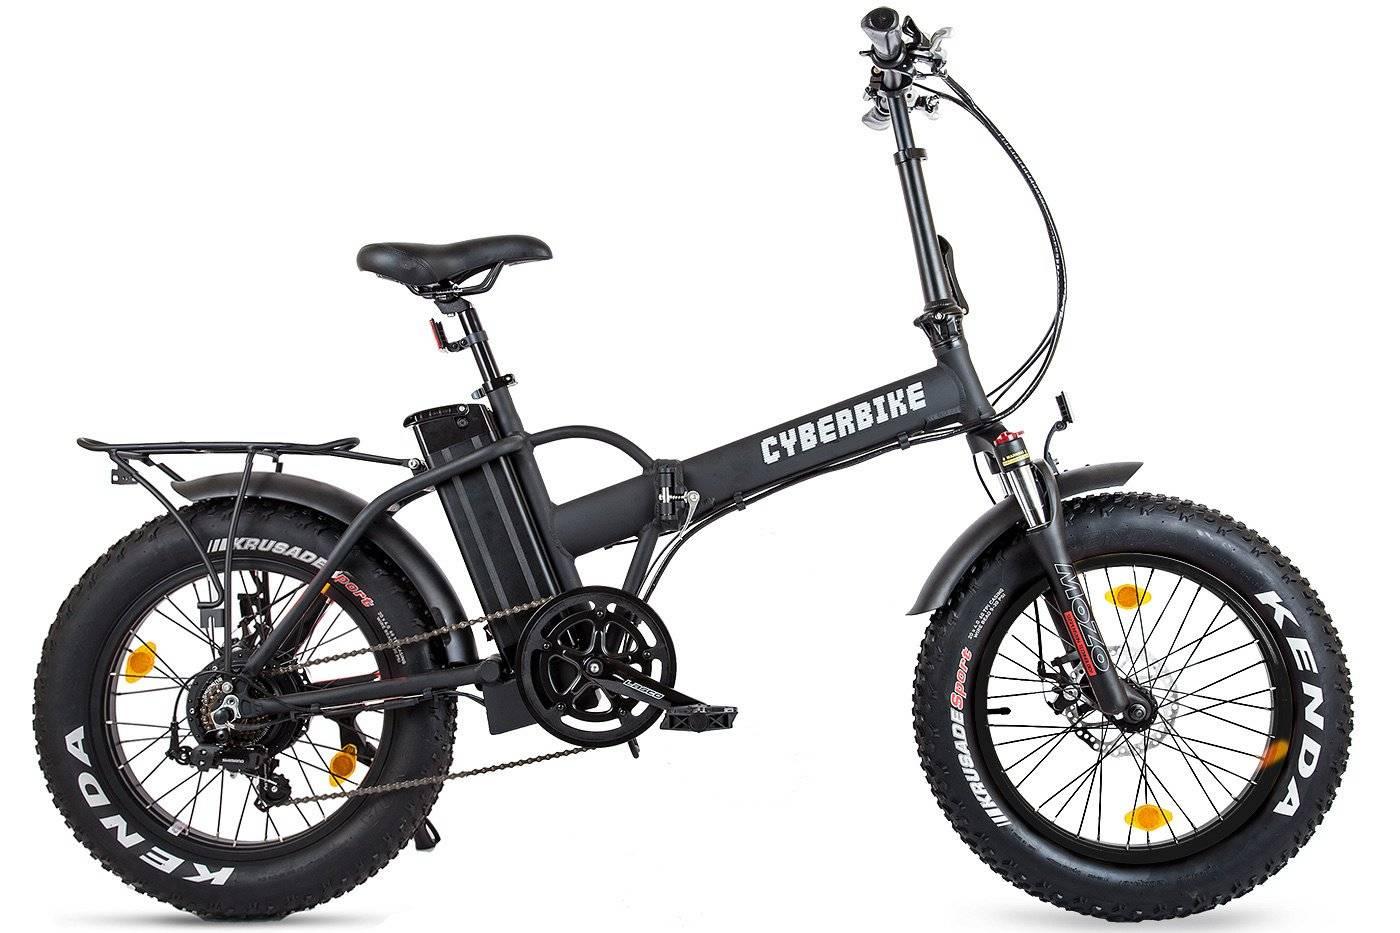 Велогибрид Cyberbike 500 Вт, 019282-1906, фото 4